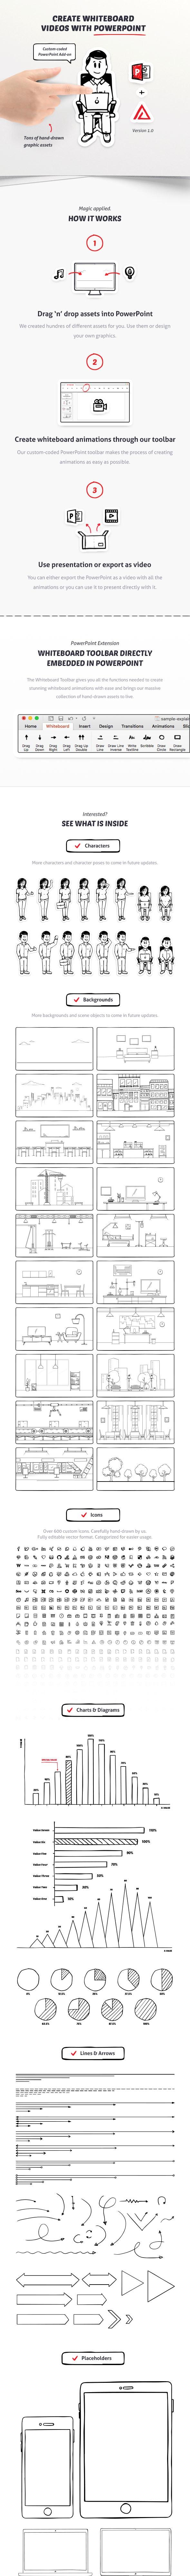 Whiteboard PowerPoint Toolkit - PowerPoint Templates Presentation Templates